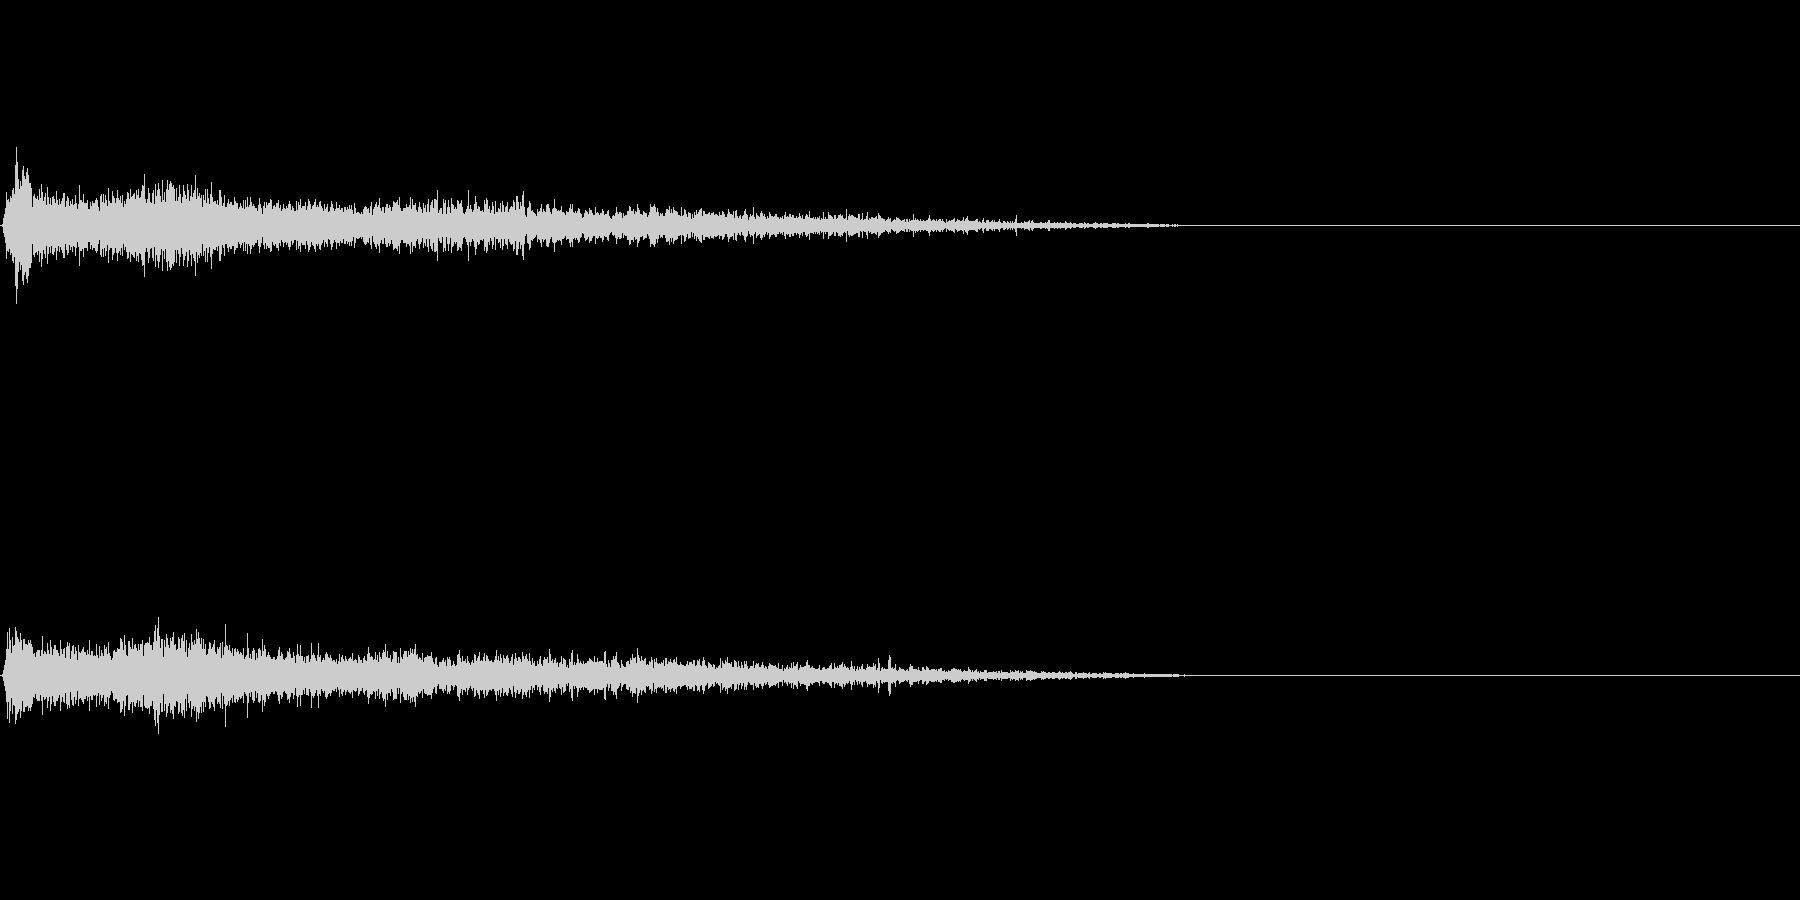 Dマイナー インパクト音 衝撃音の未再生の波形